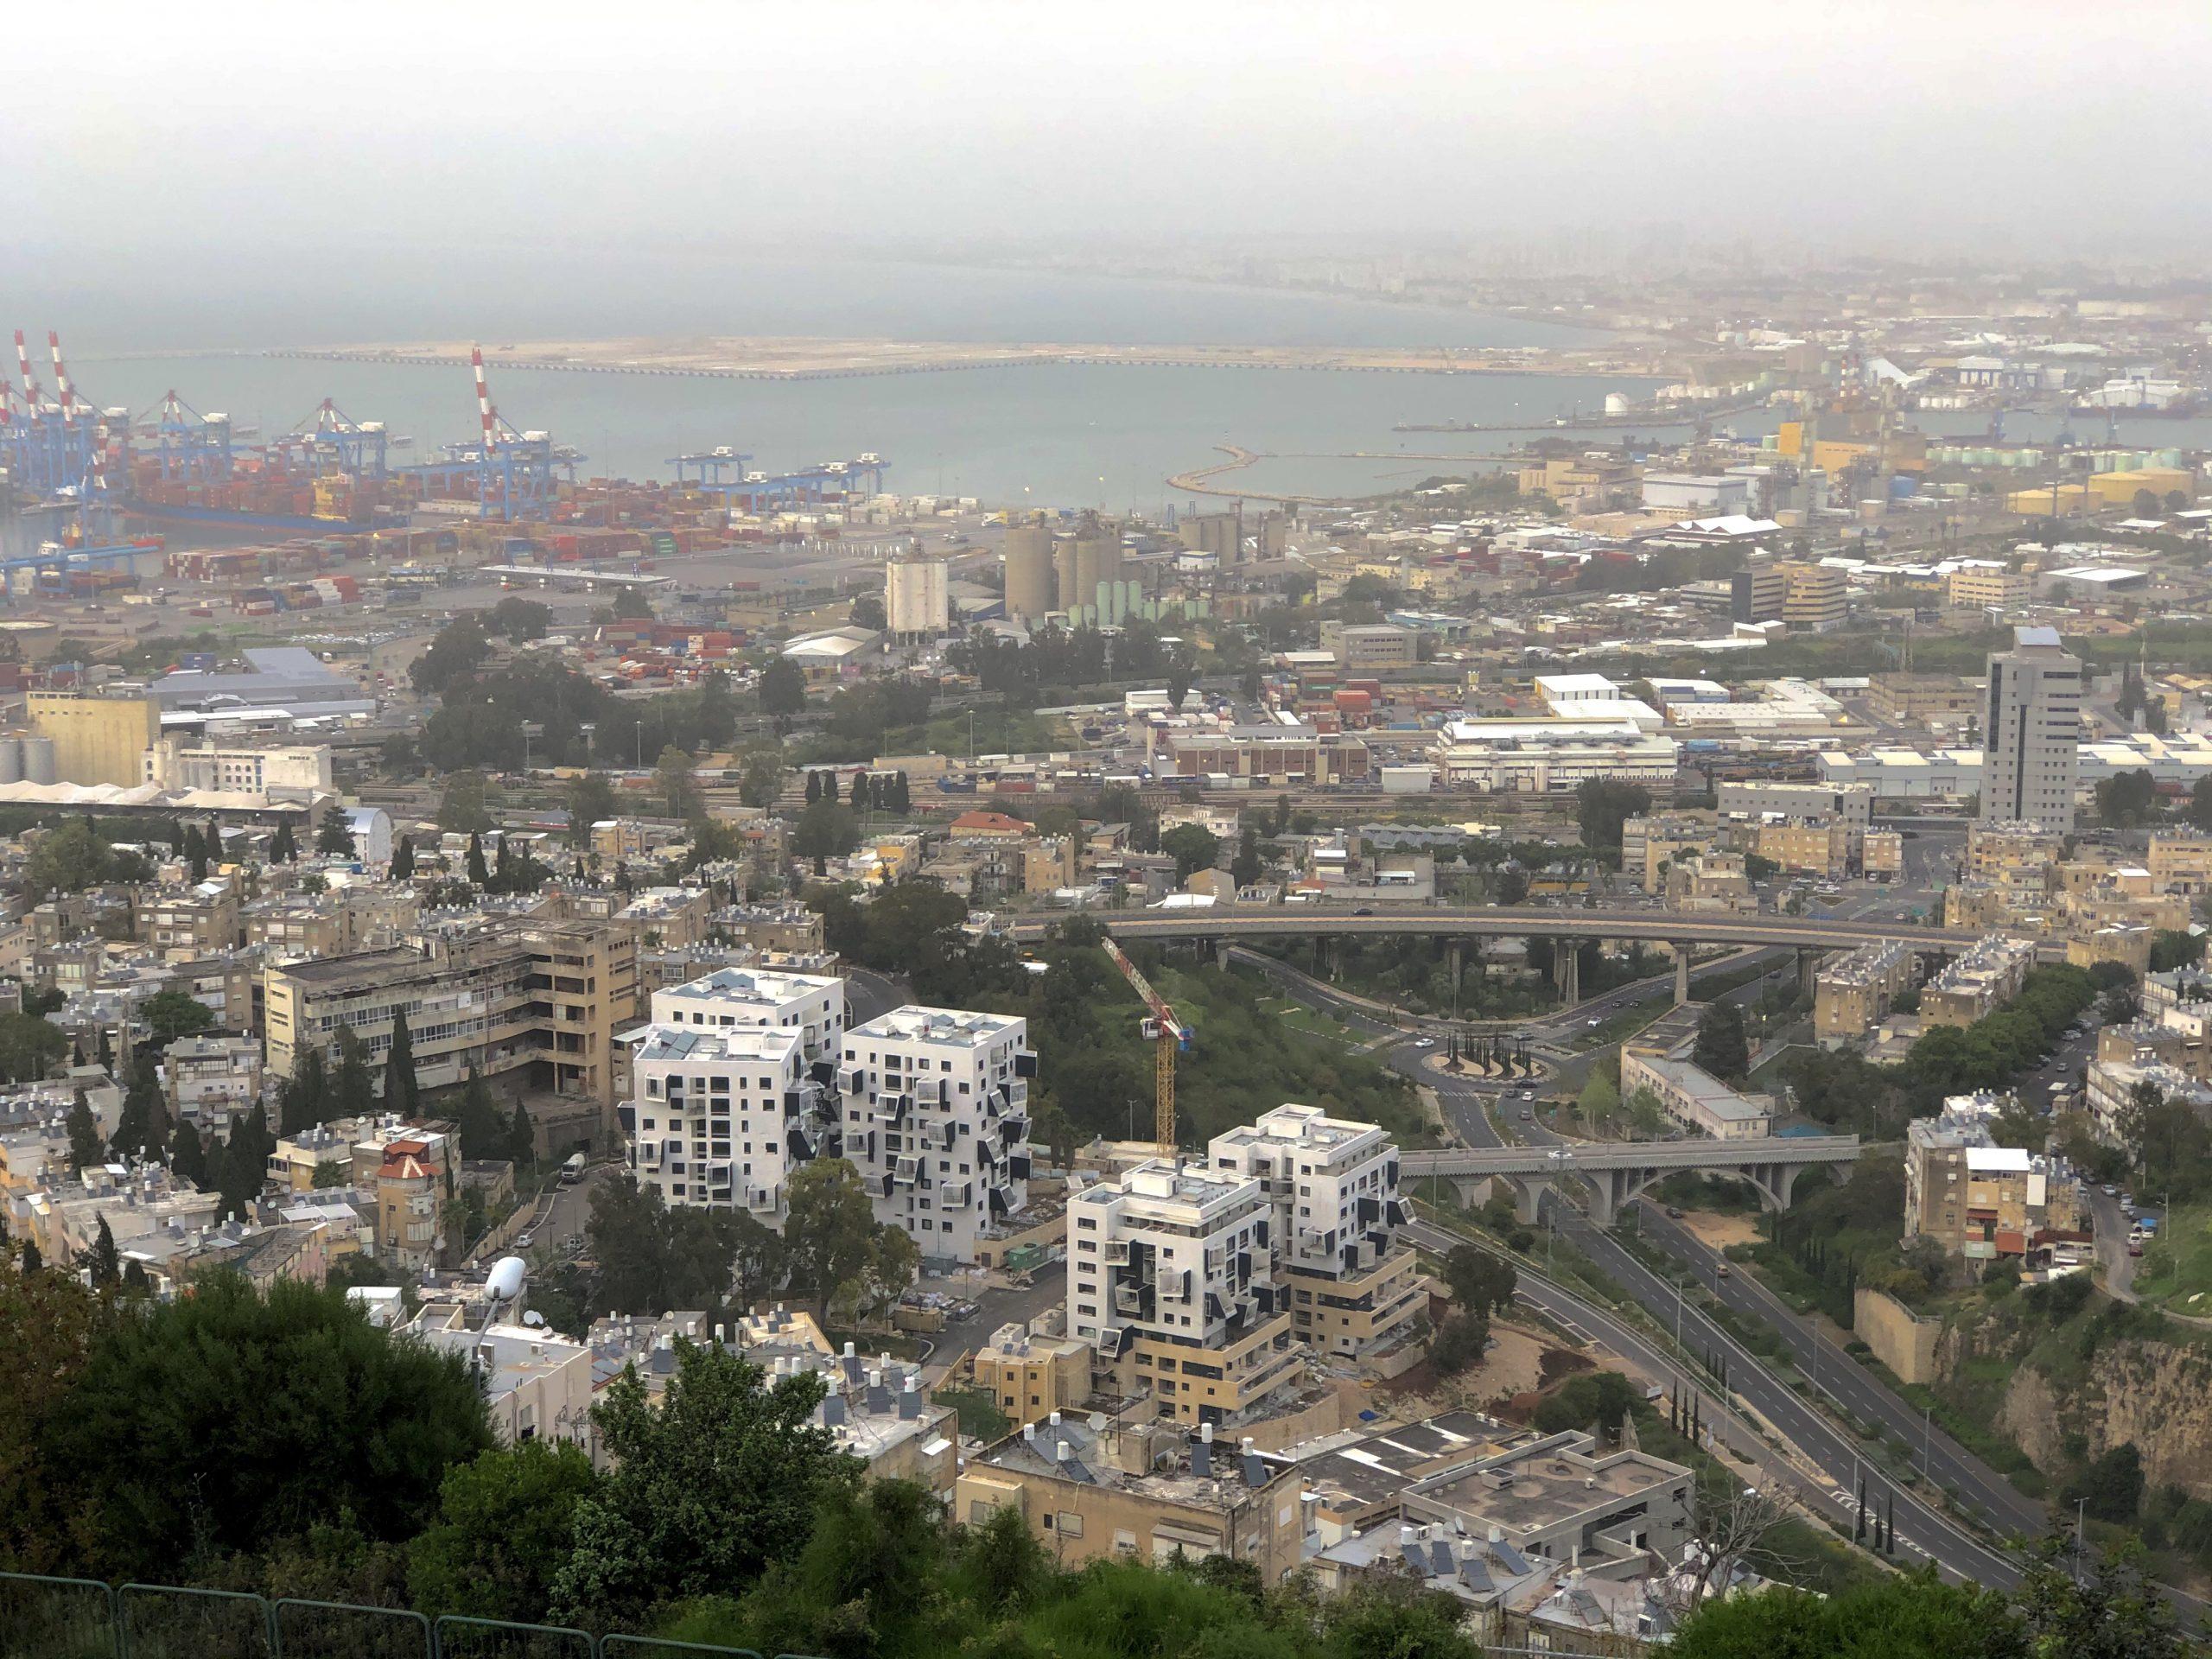 COVID-19: Haifa under lockdown